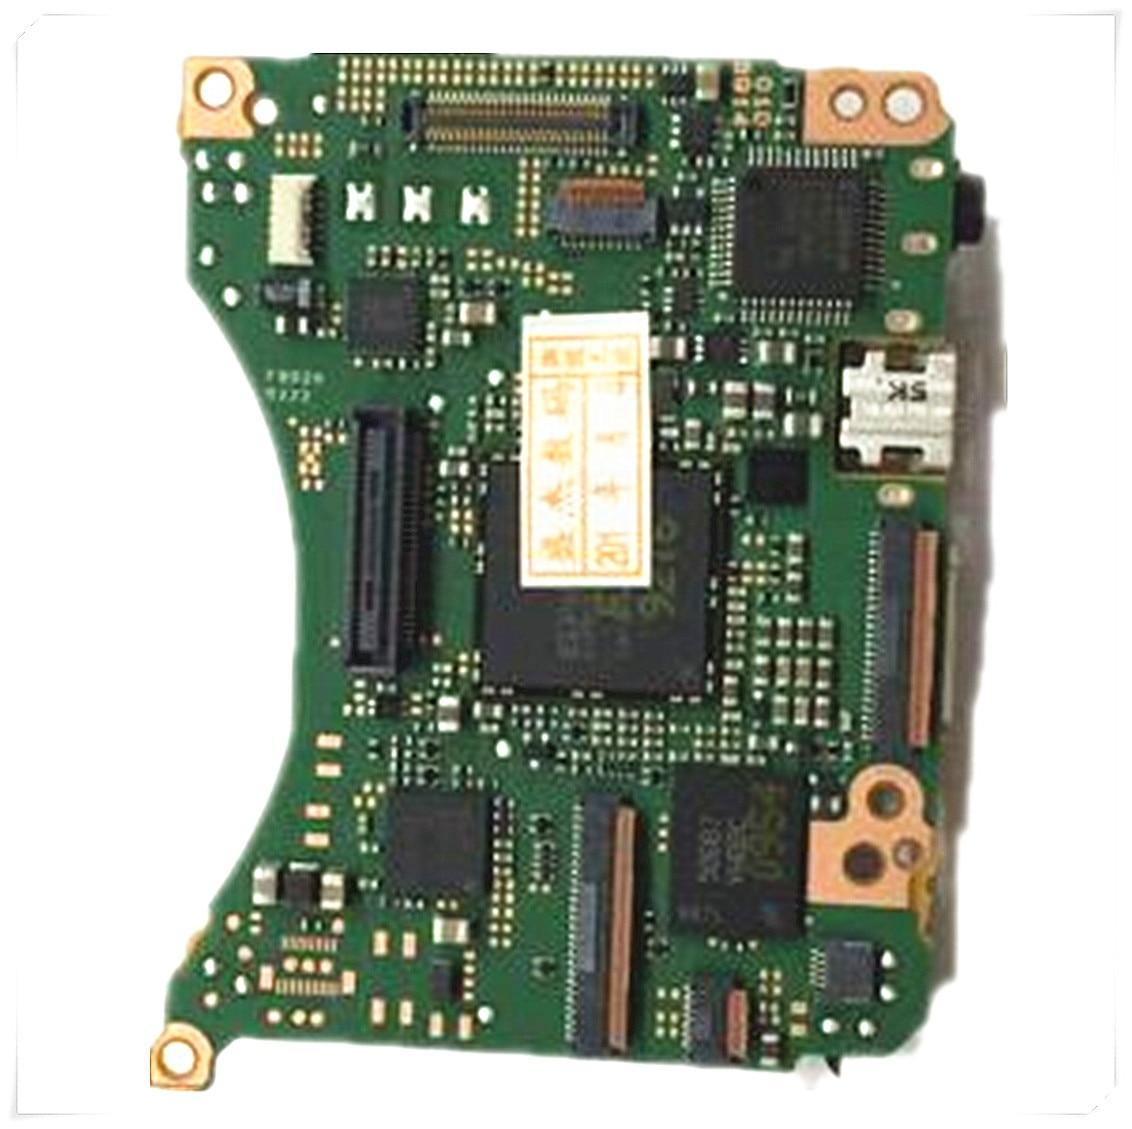 100%  NEW original G16 Digital Camera Main Board/Mother Board testing working for CANON G16 100%new and original fbs cb55 fatek communication board